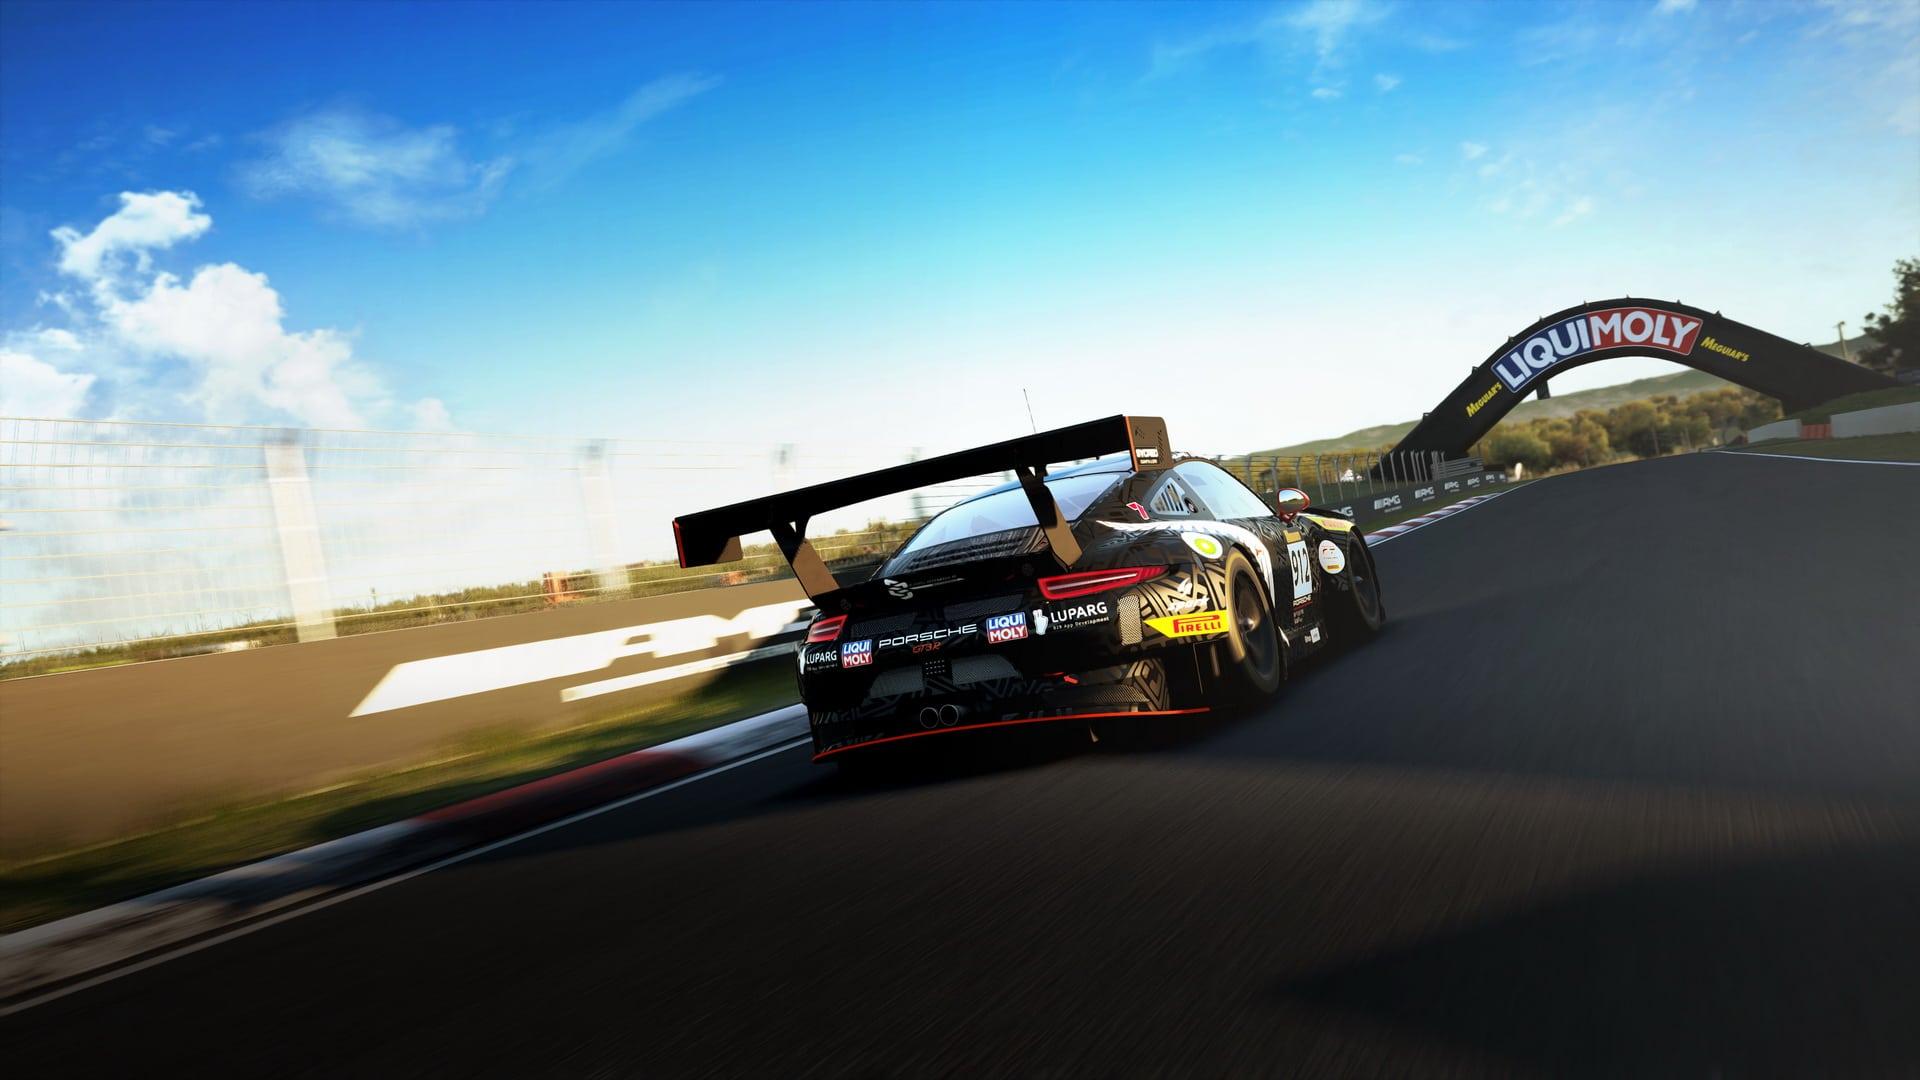 Assetto Corsa Competizione arrive sur Playstation 4 et Xbox One